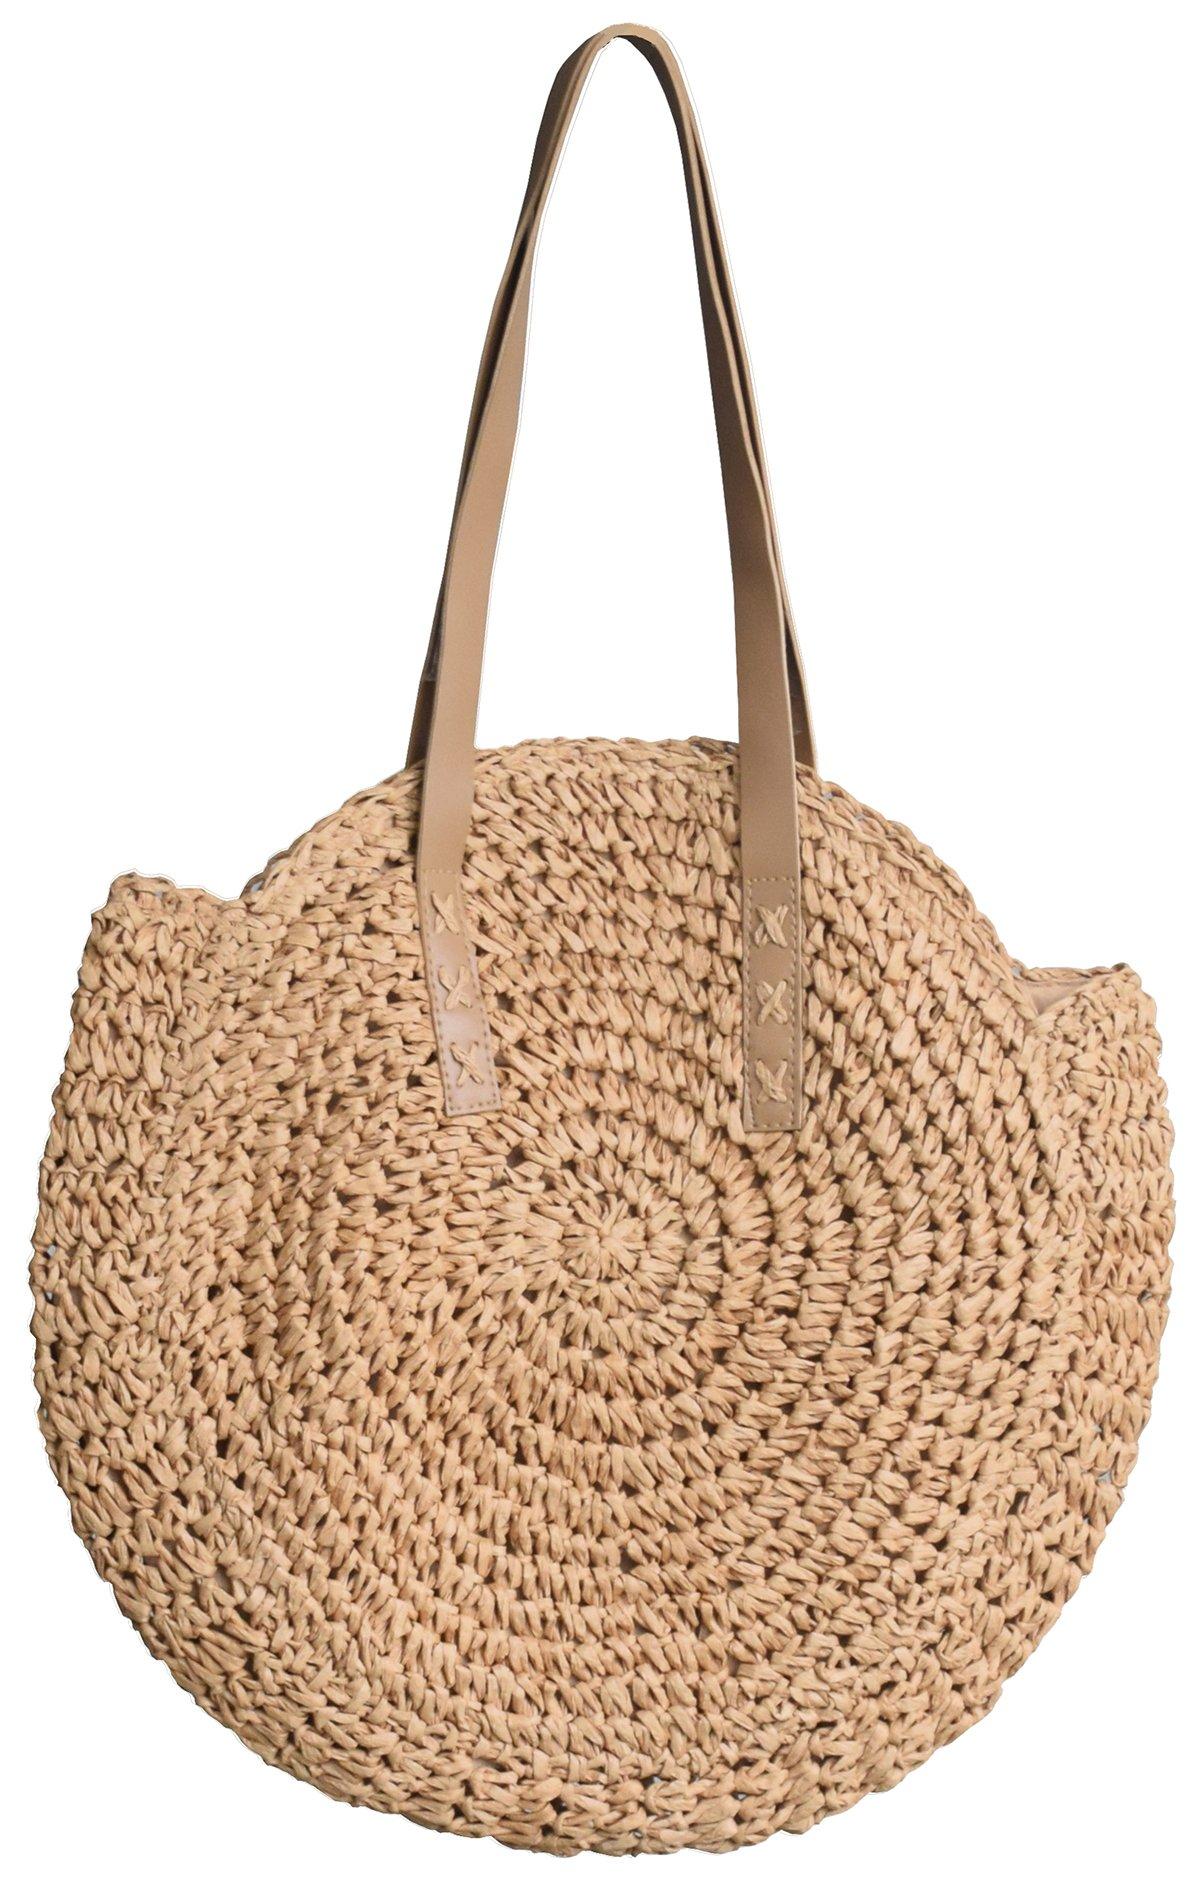 Molodo Summer Straw Handbags Top Handle Crossbody Shoulder Satchels Tote Beach Purse Bags